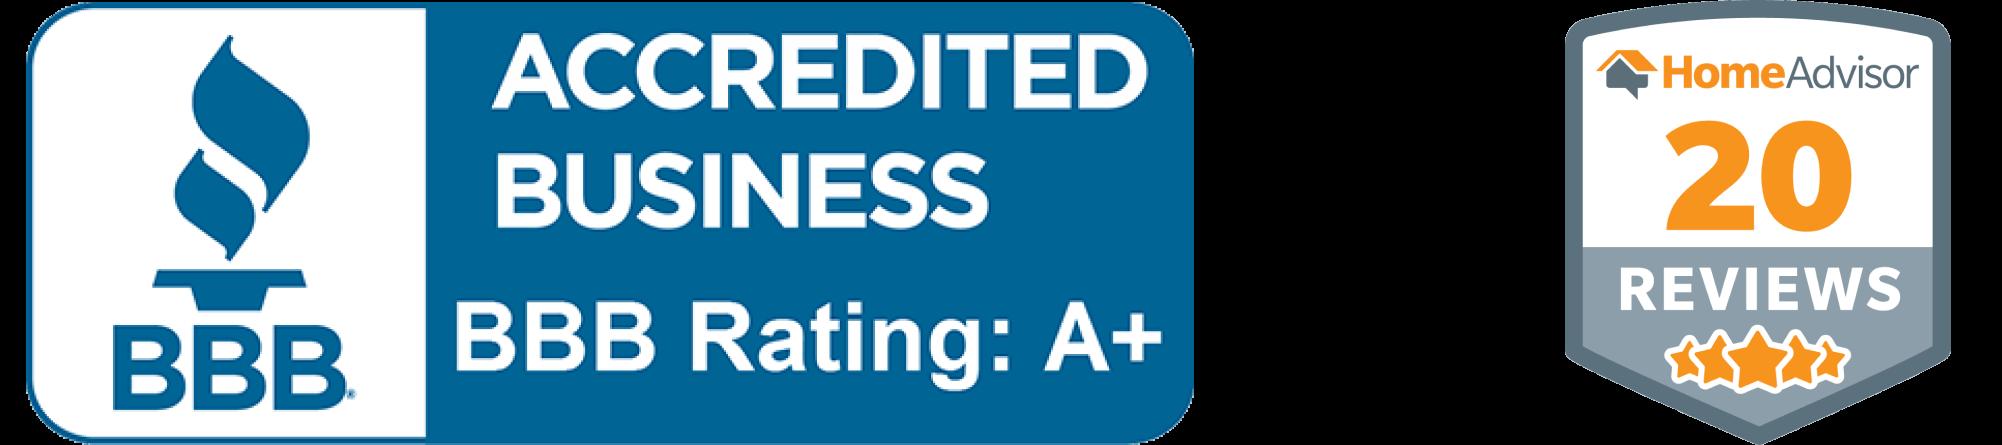 Better Business Bureau Accredited A+ Rating Home Advisor 5 star reviews